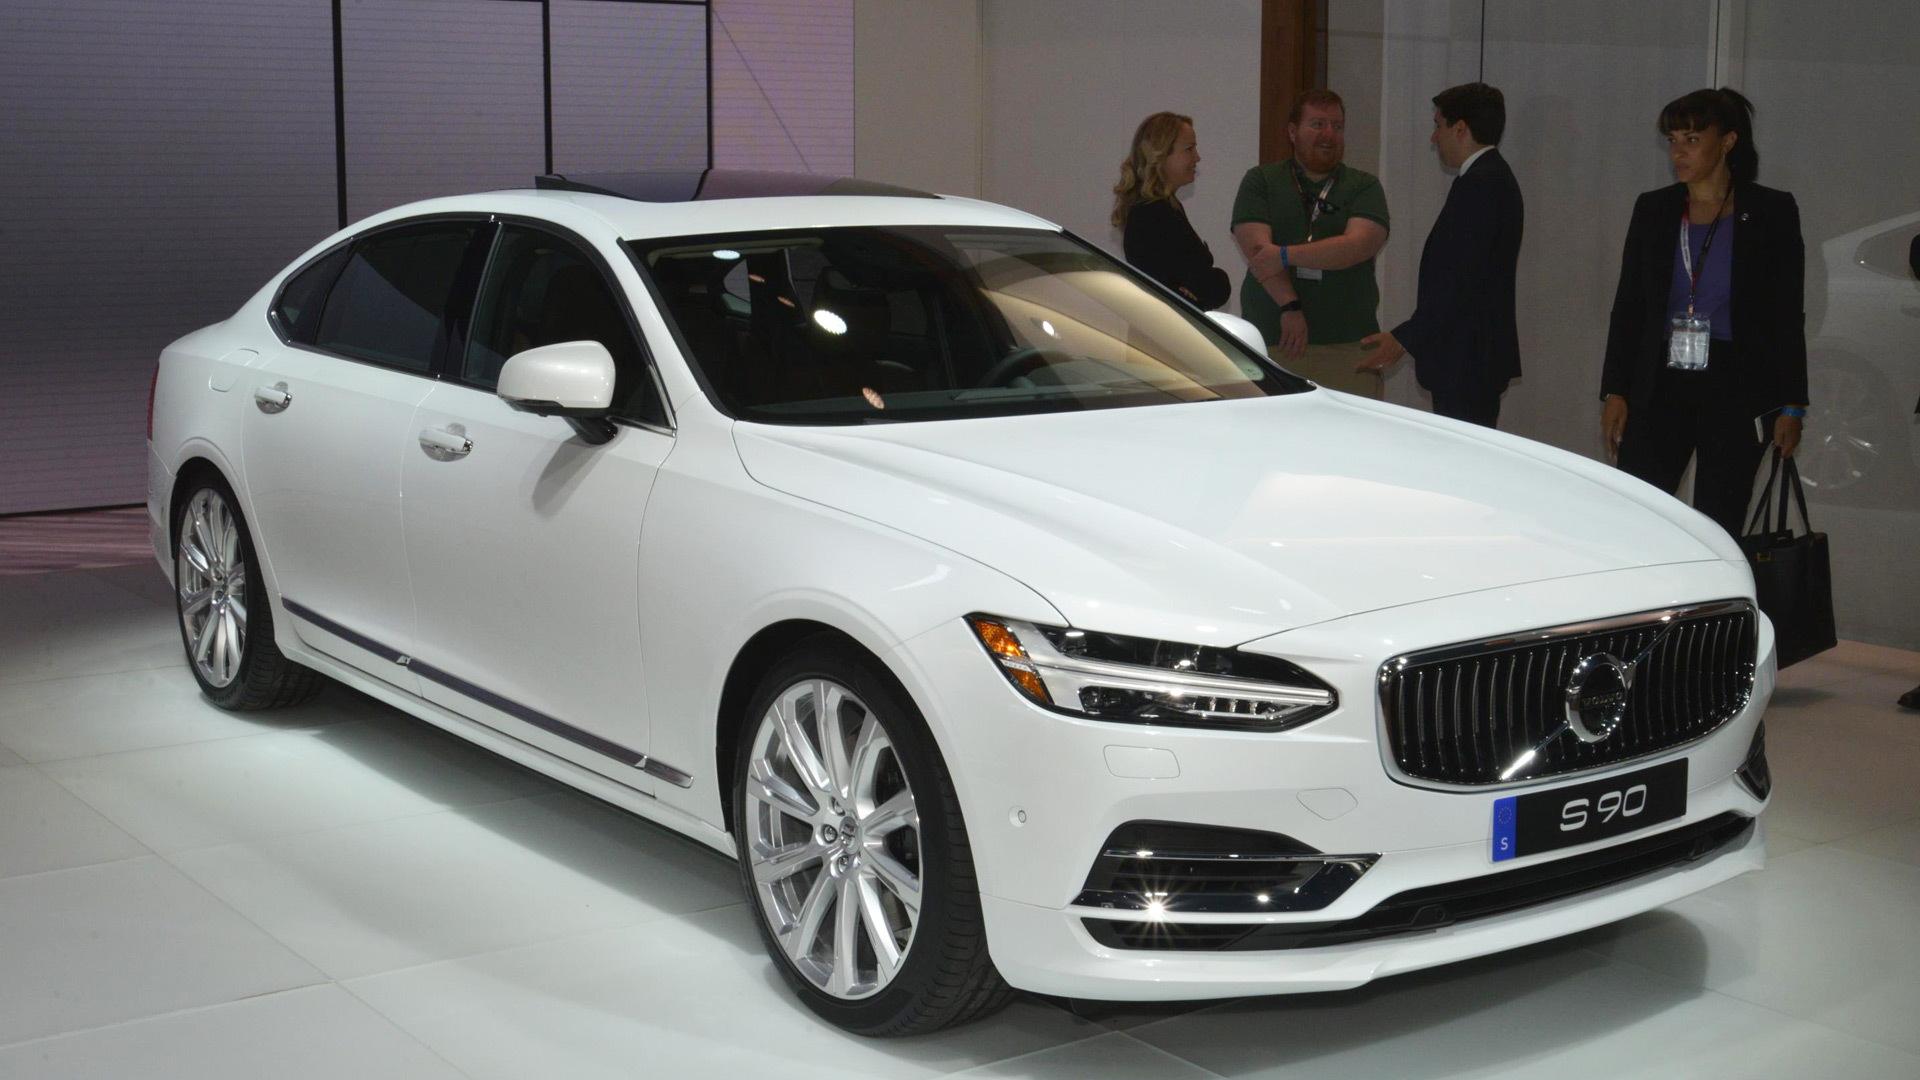 2018 Volvo S90, 2017 New York auto show